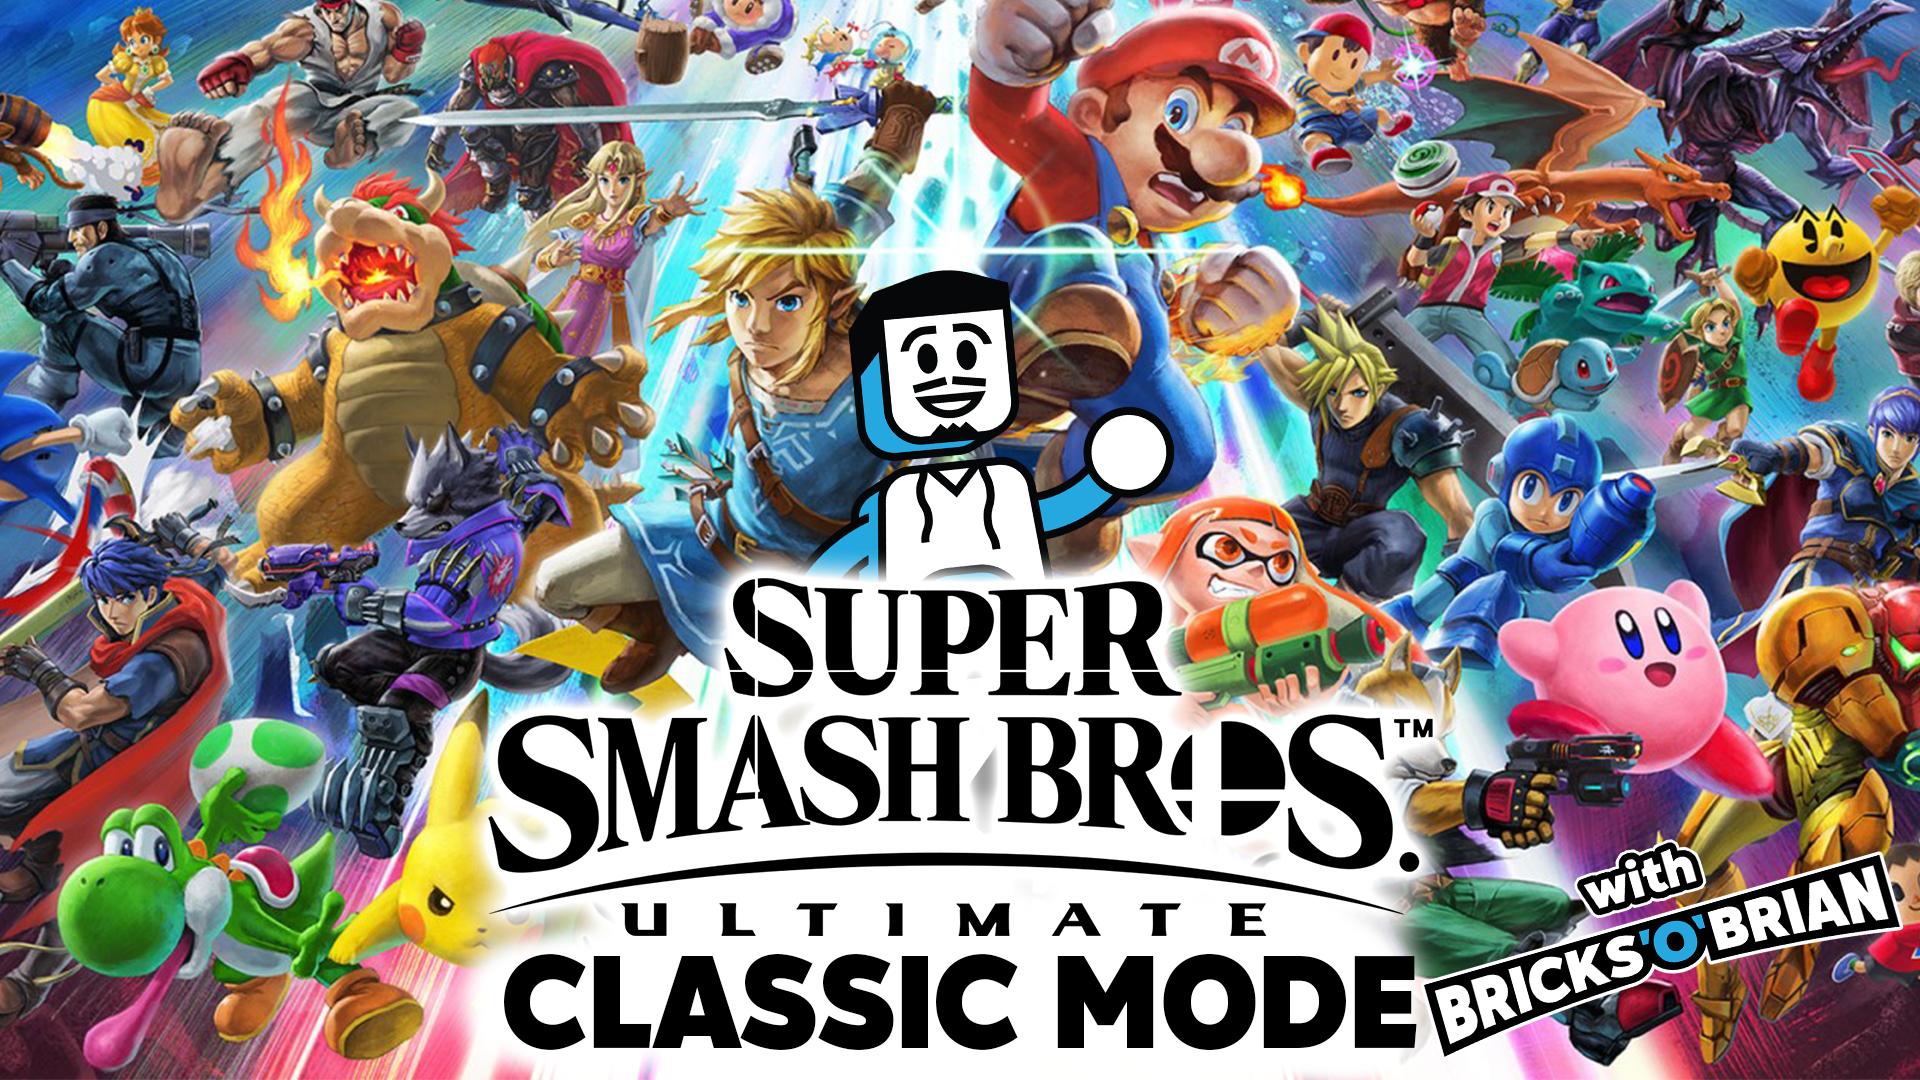 Watch Super Smash Bros Ultimate Playthrough With Mojo Matt